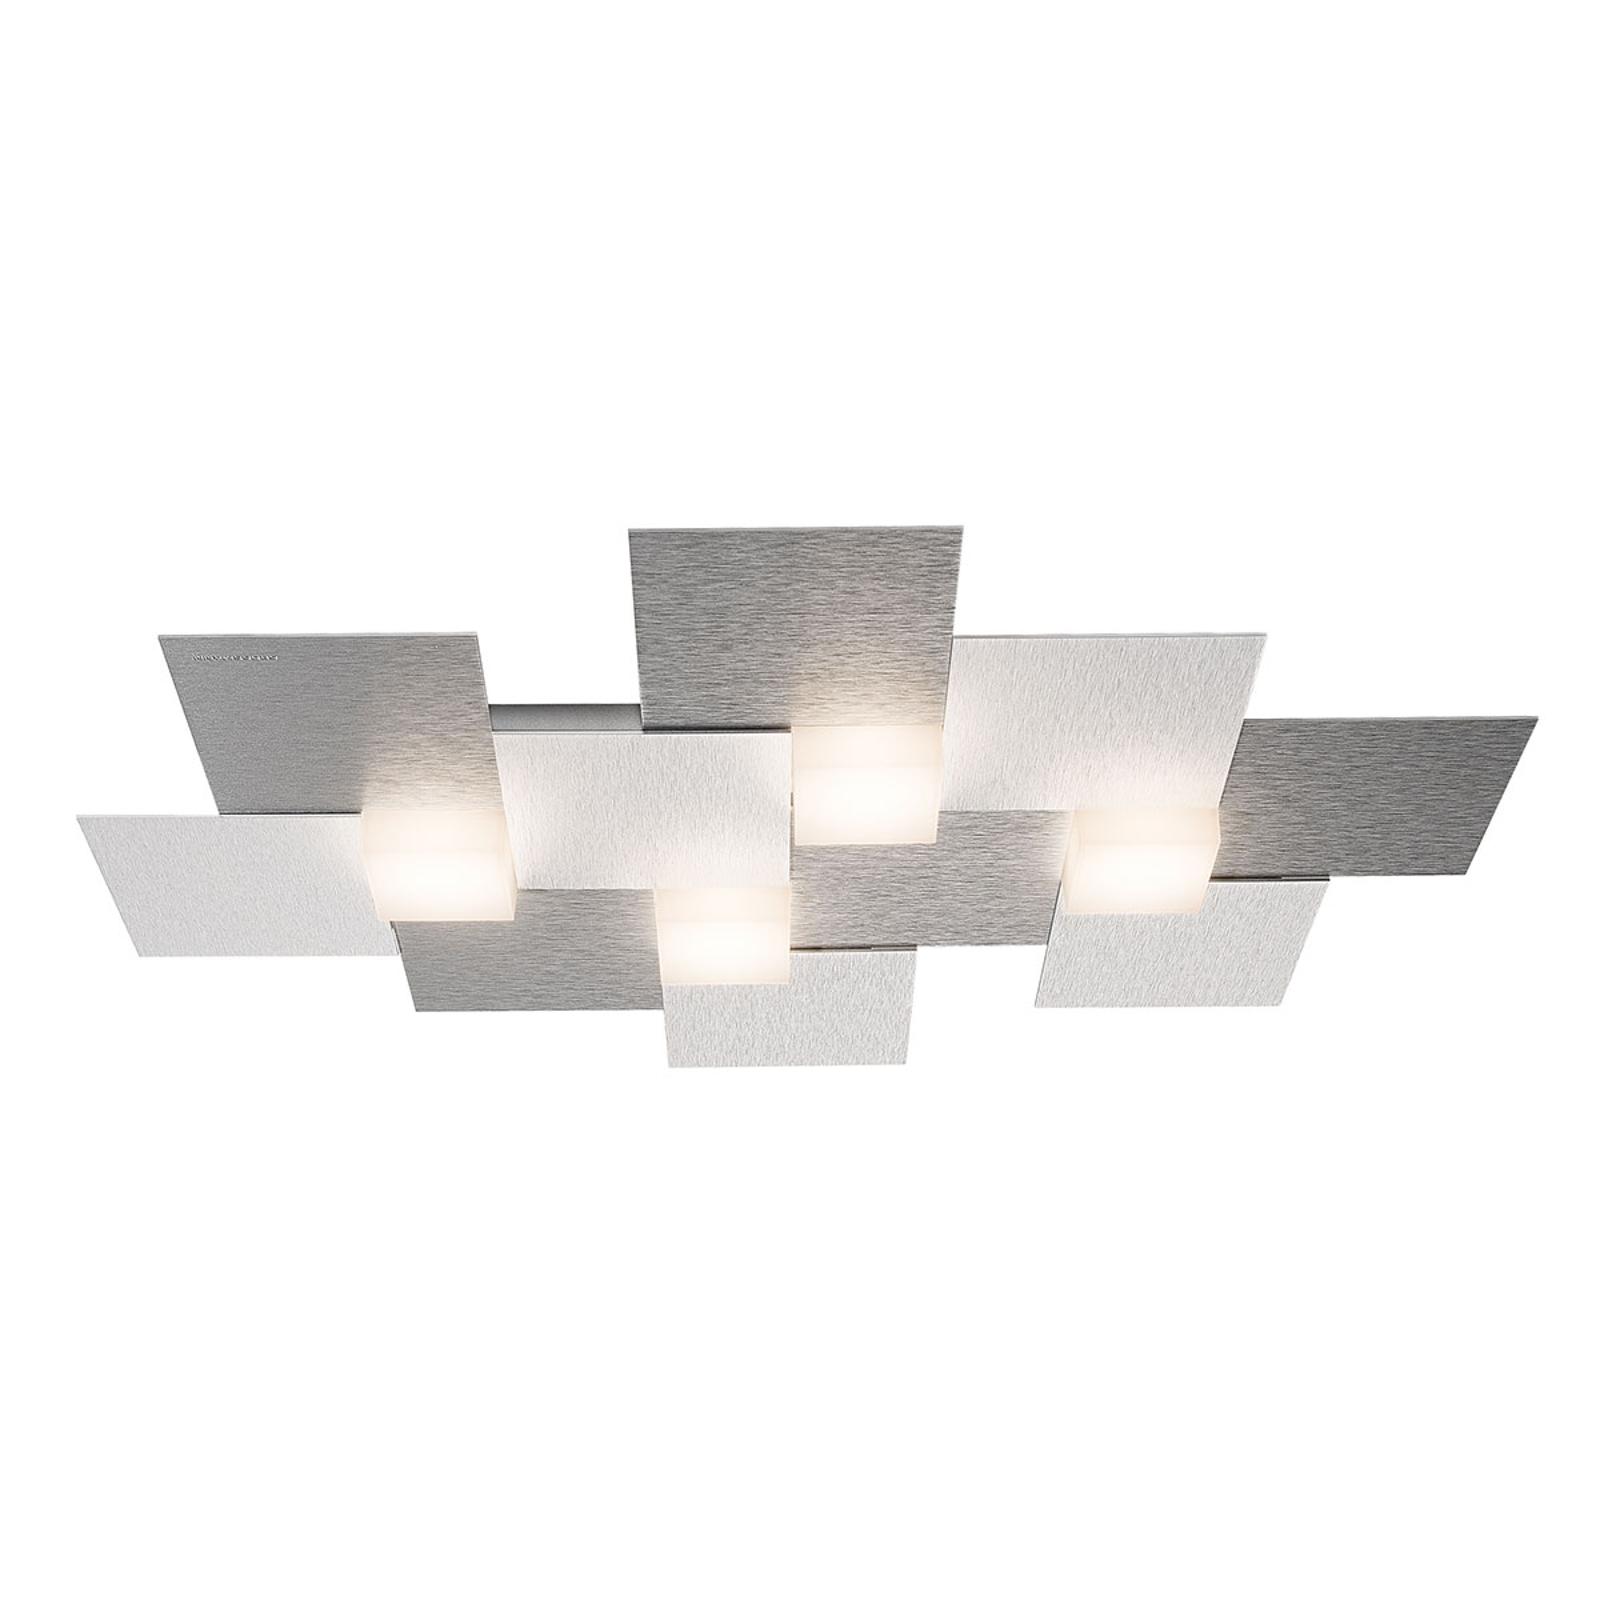 GROSSMANN Creo plafonnier 4 lampes 55x38,5 alu